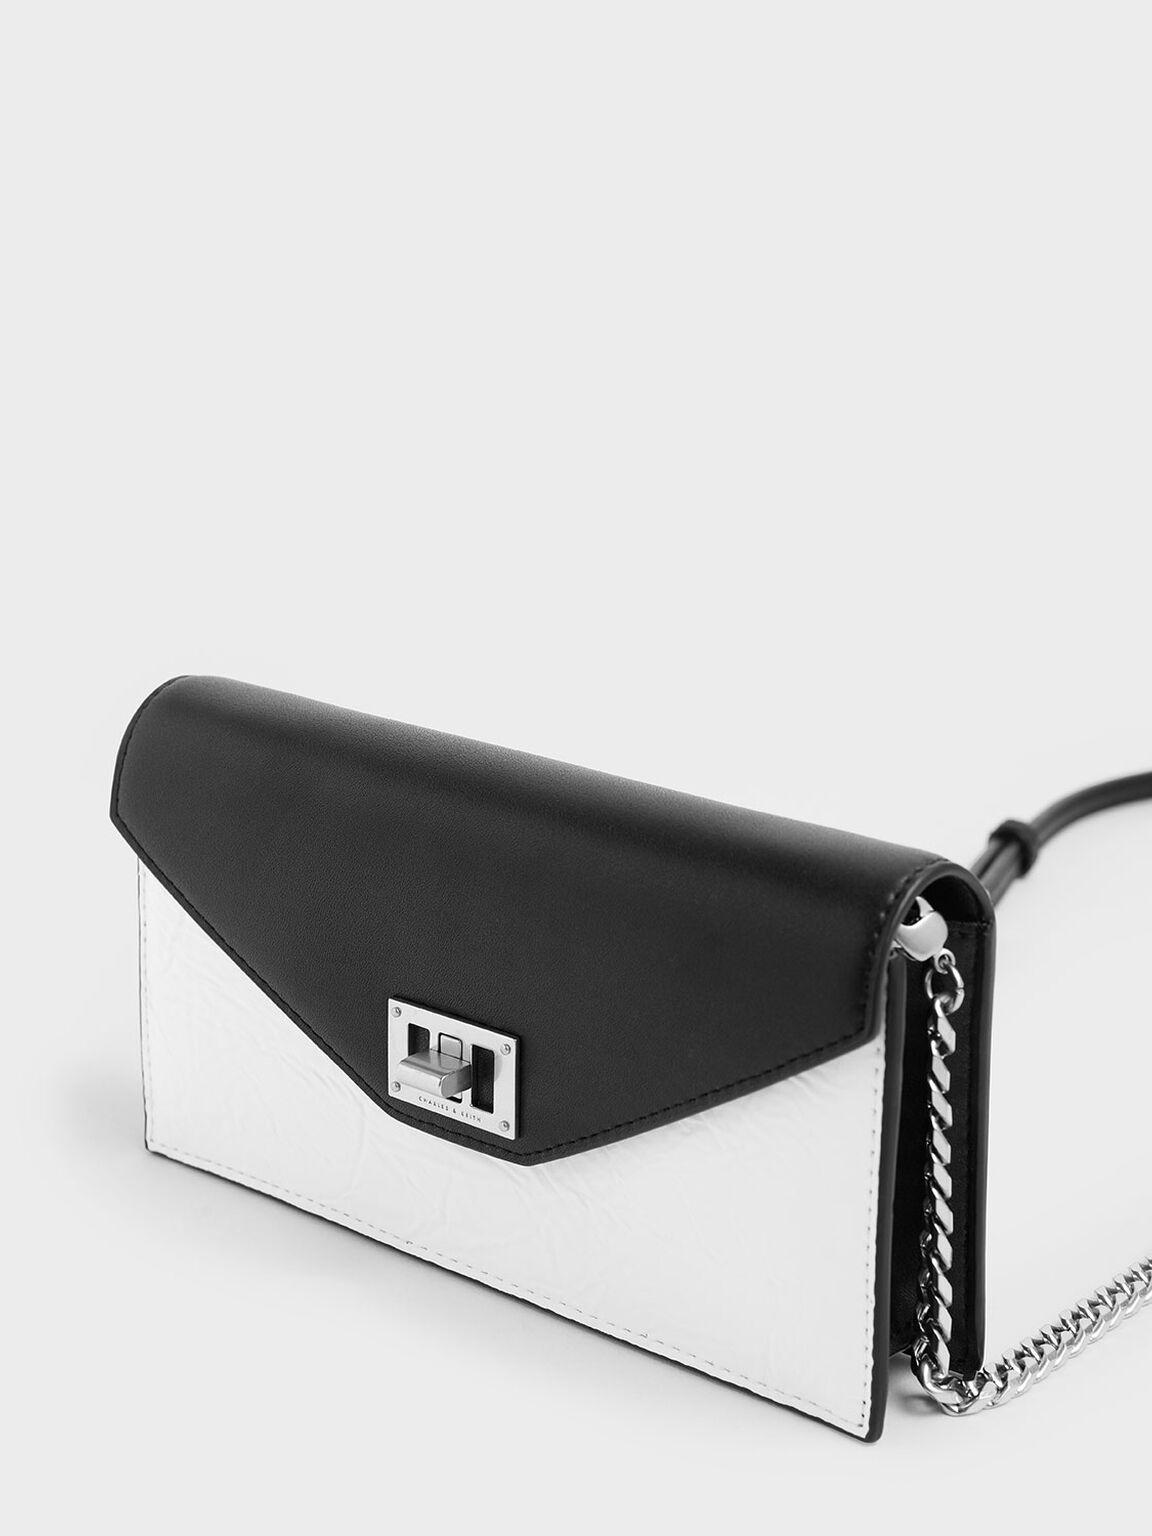 Two-Tone Wrinkled Effect Long Envelope Wallet, White, hi-res